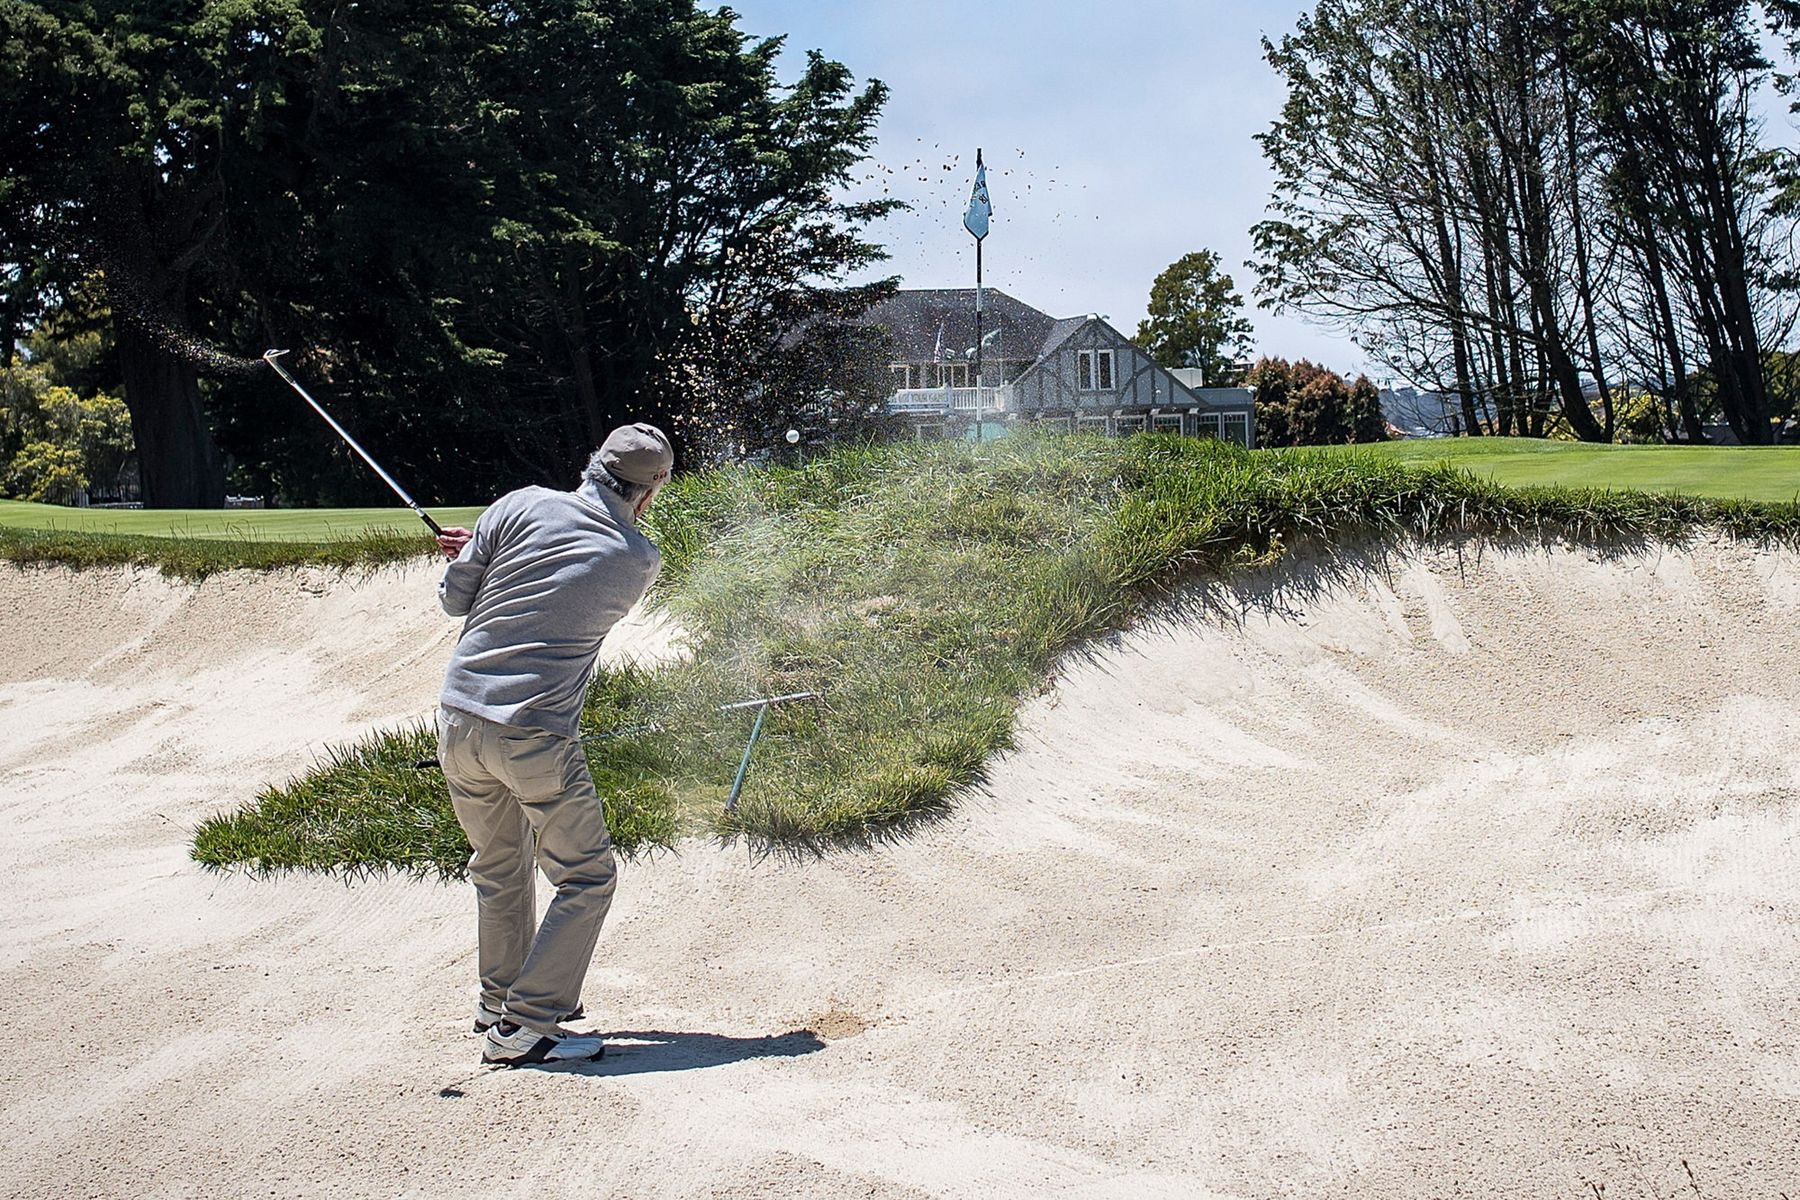 Retirees As U.S. Rule To ProtectRetirementSavers Vanishes